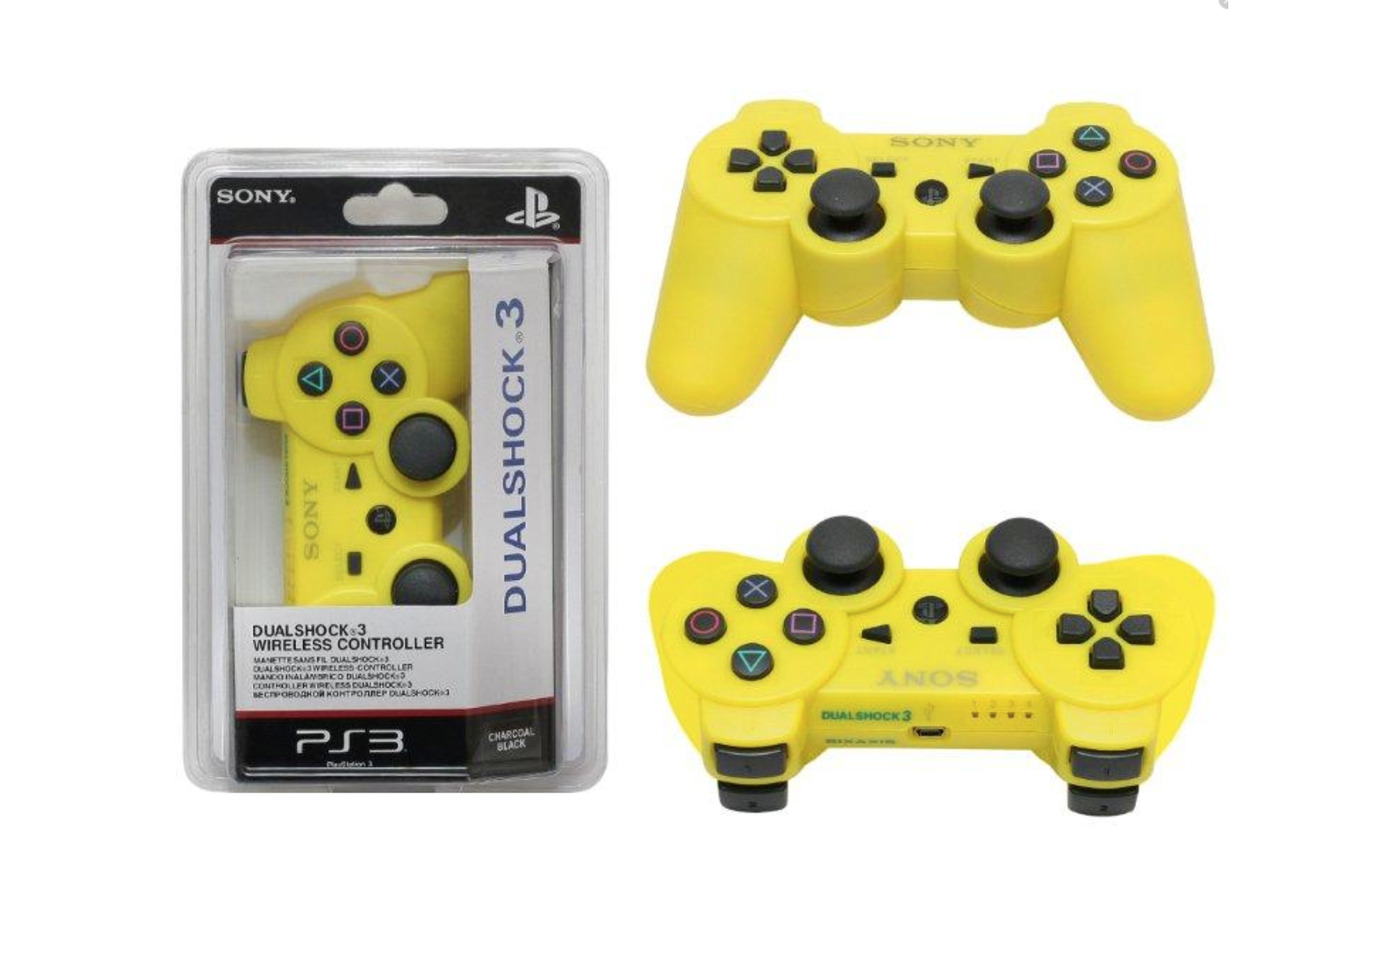 Джойстик Sony DualShock 3 для PS3 желтый